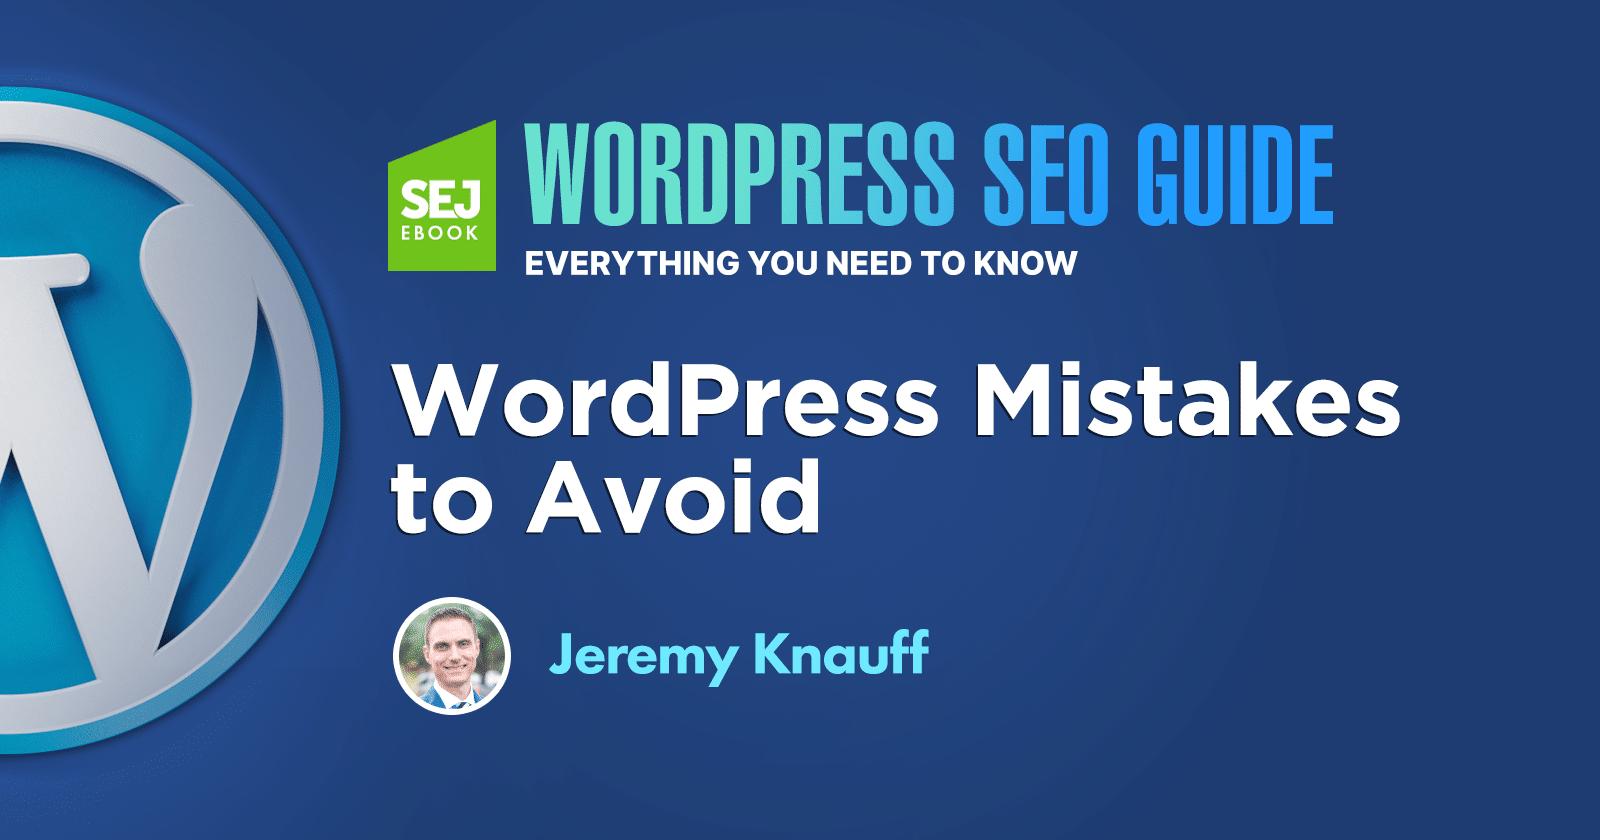 10 WordPress Mistakes to Avoid via @sejournal, @jeremyknauff